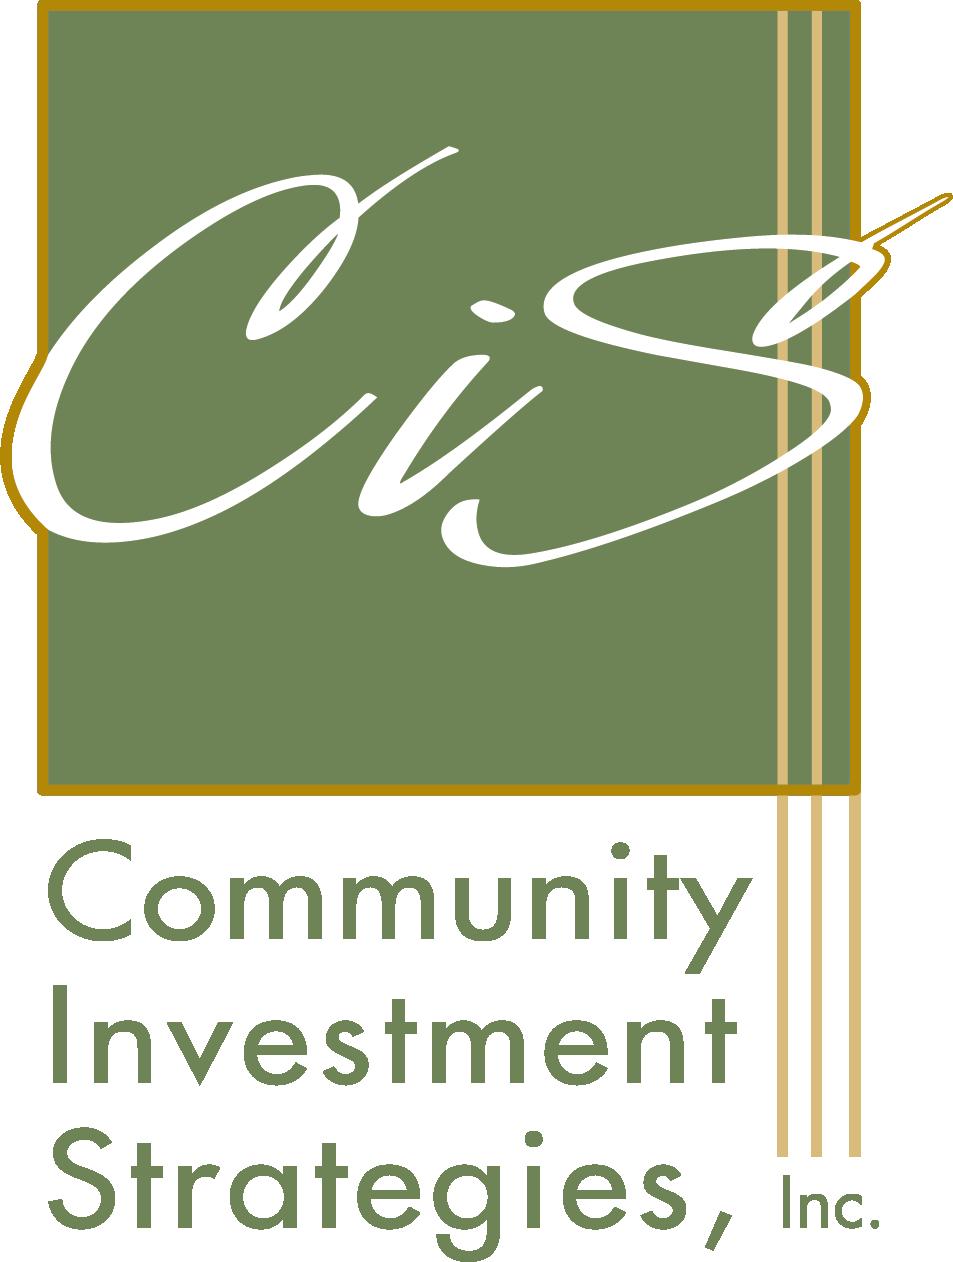 What We Do   CommunityInvestment Strategies, Inc